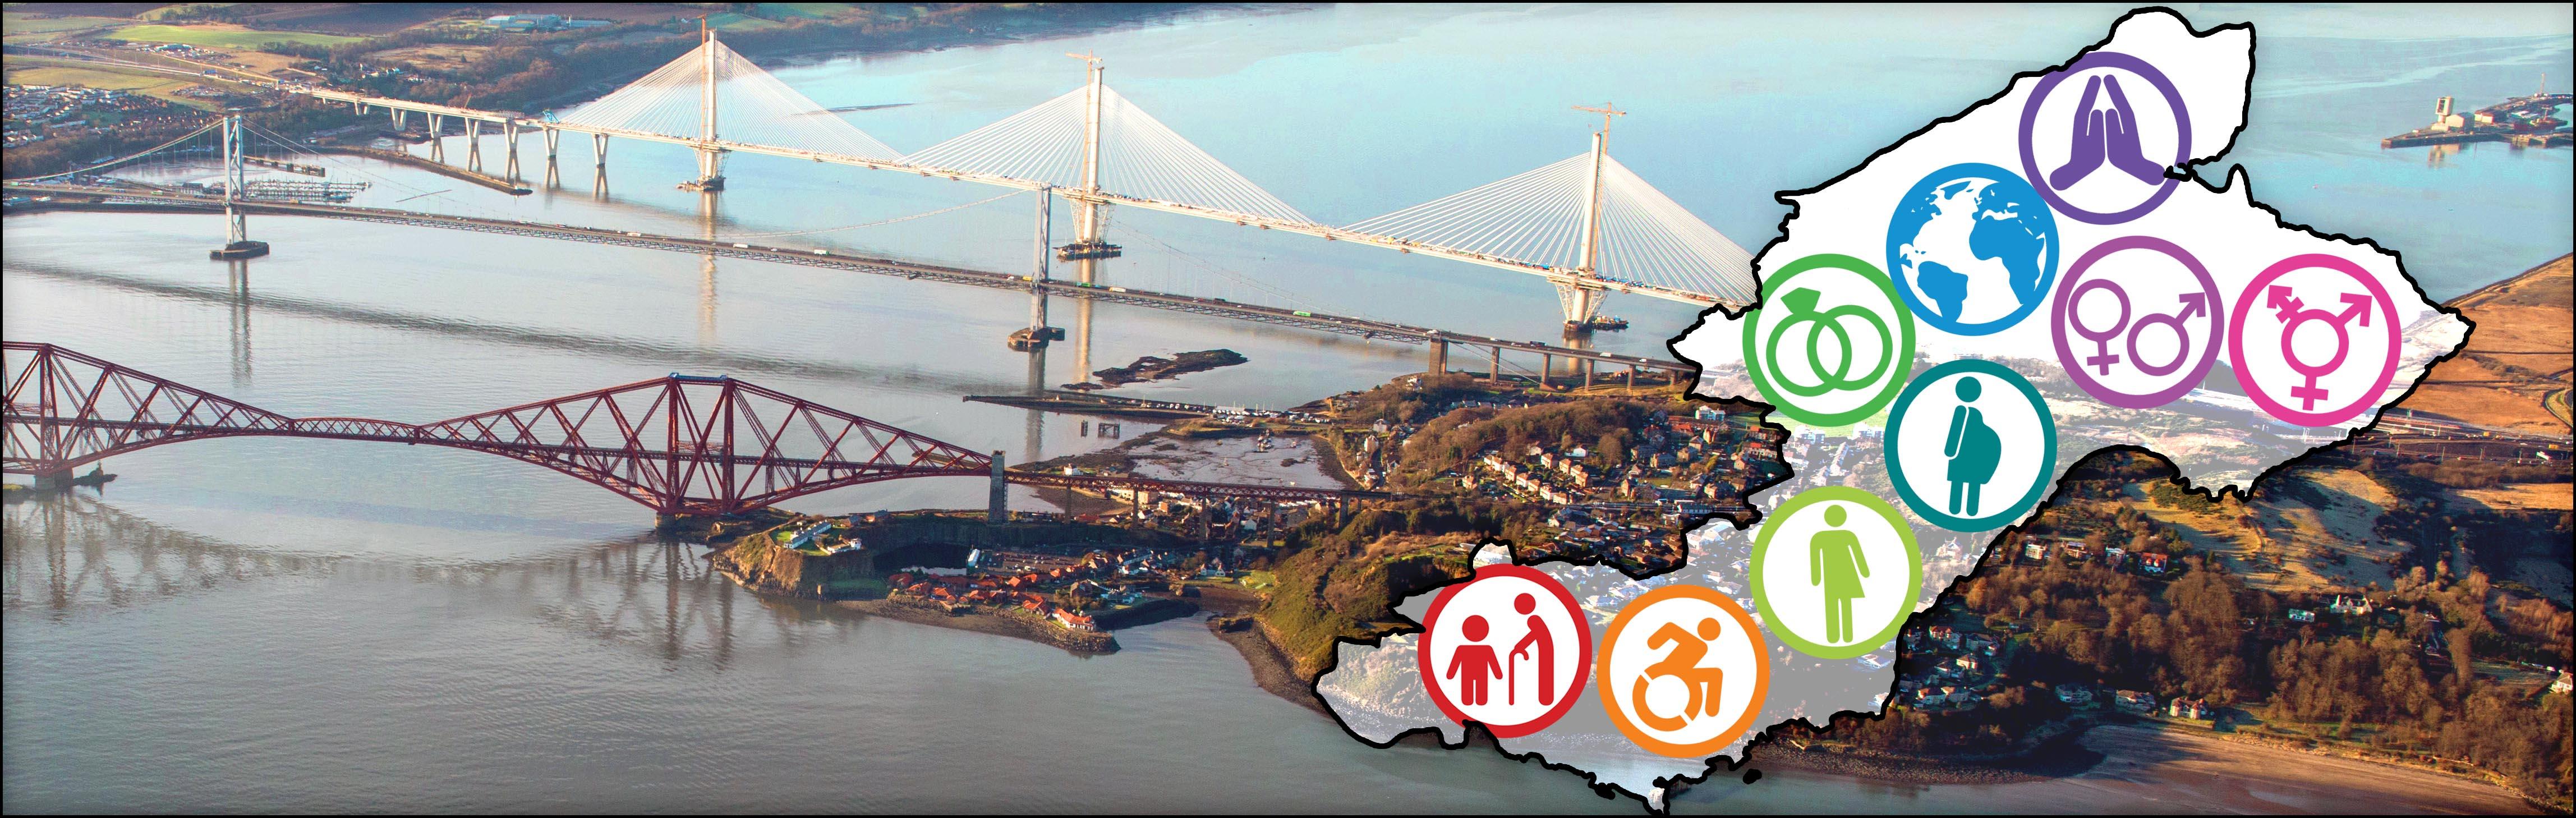 Home Page Banner - Fife Bridges